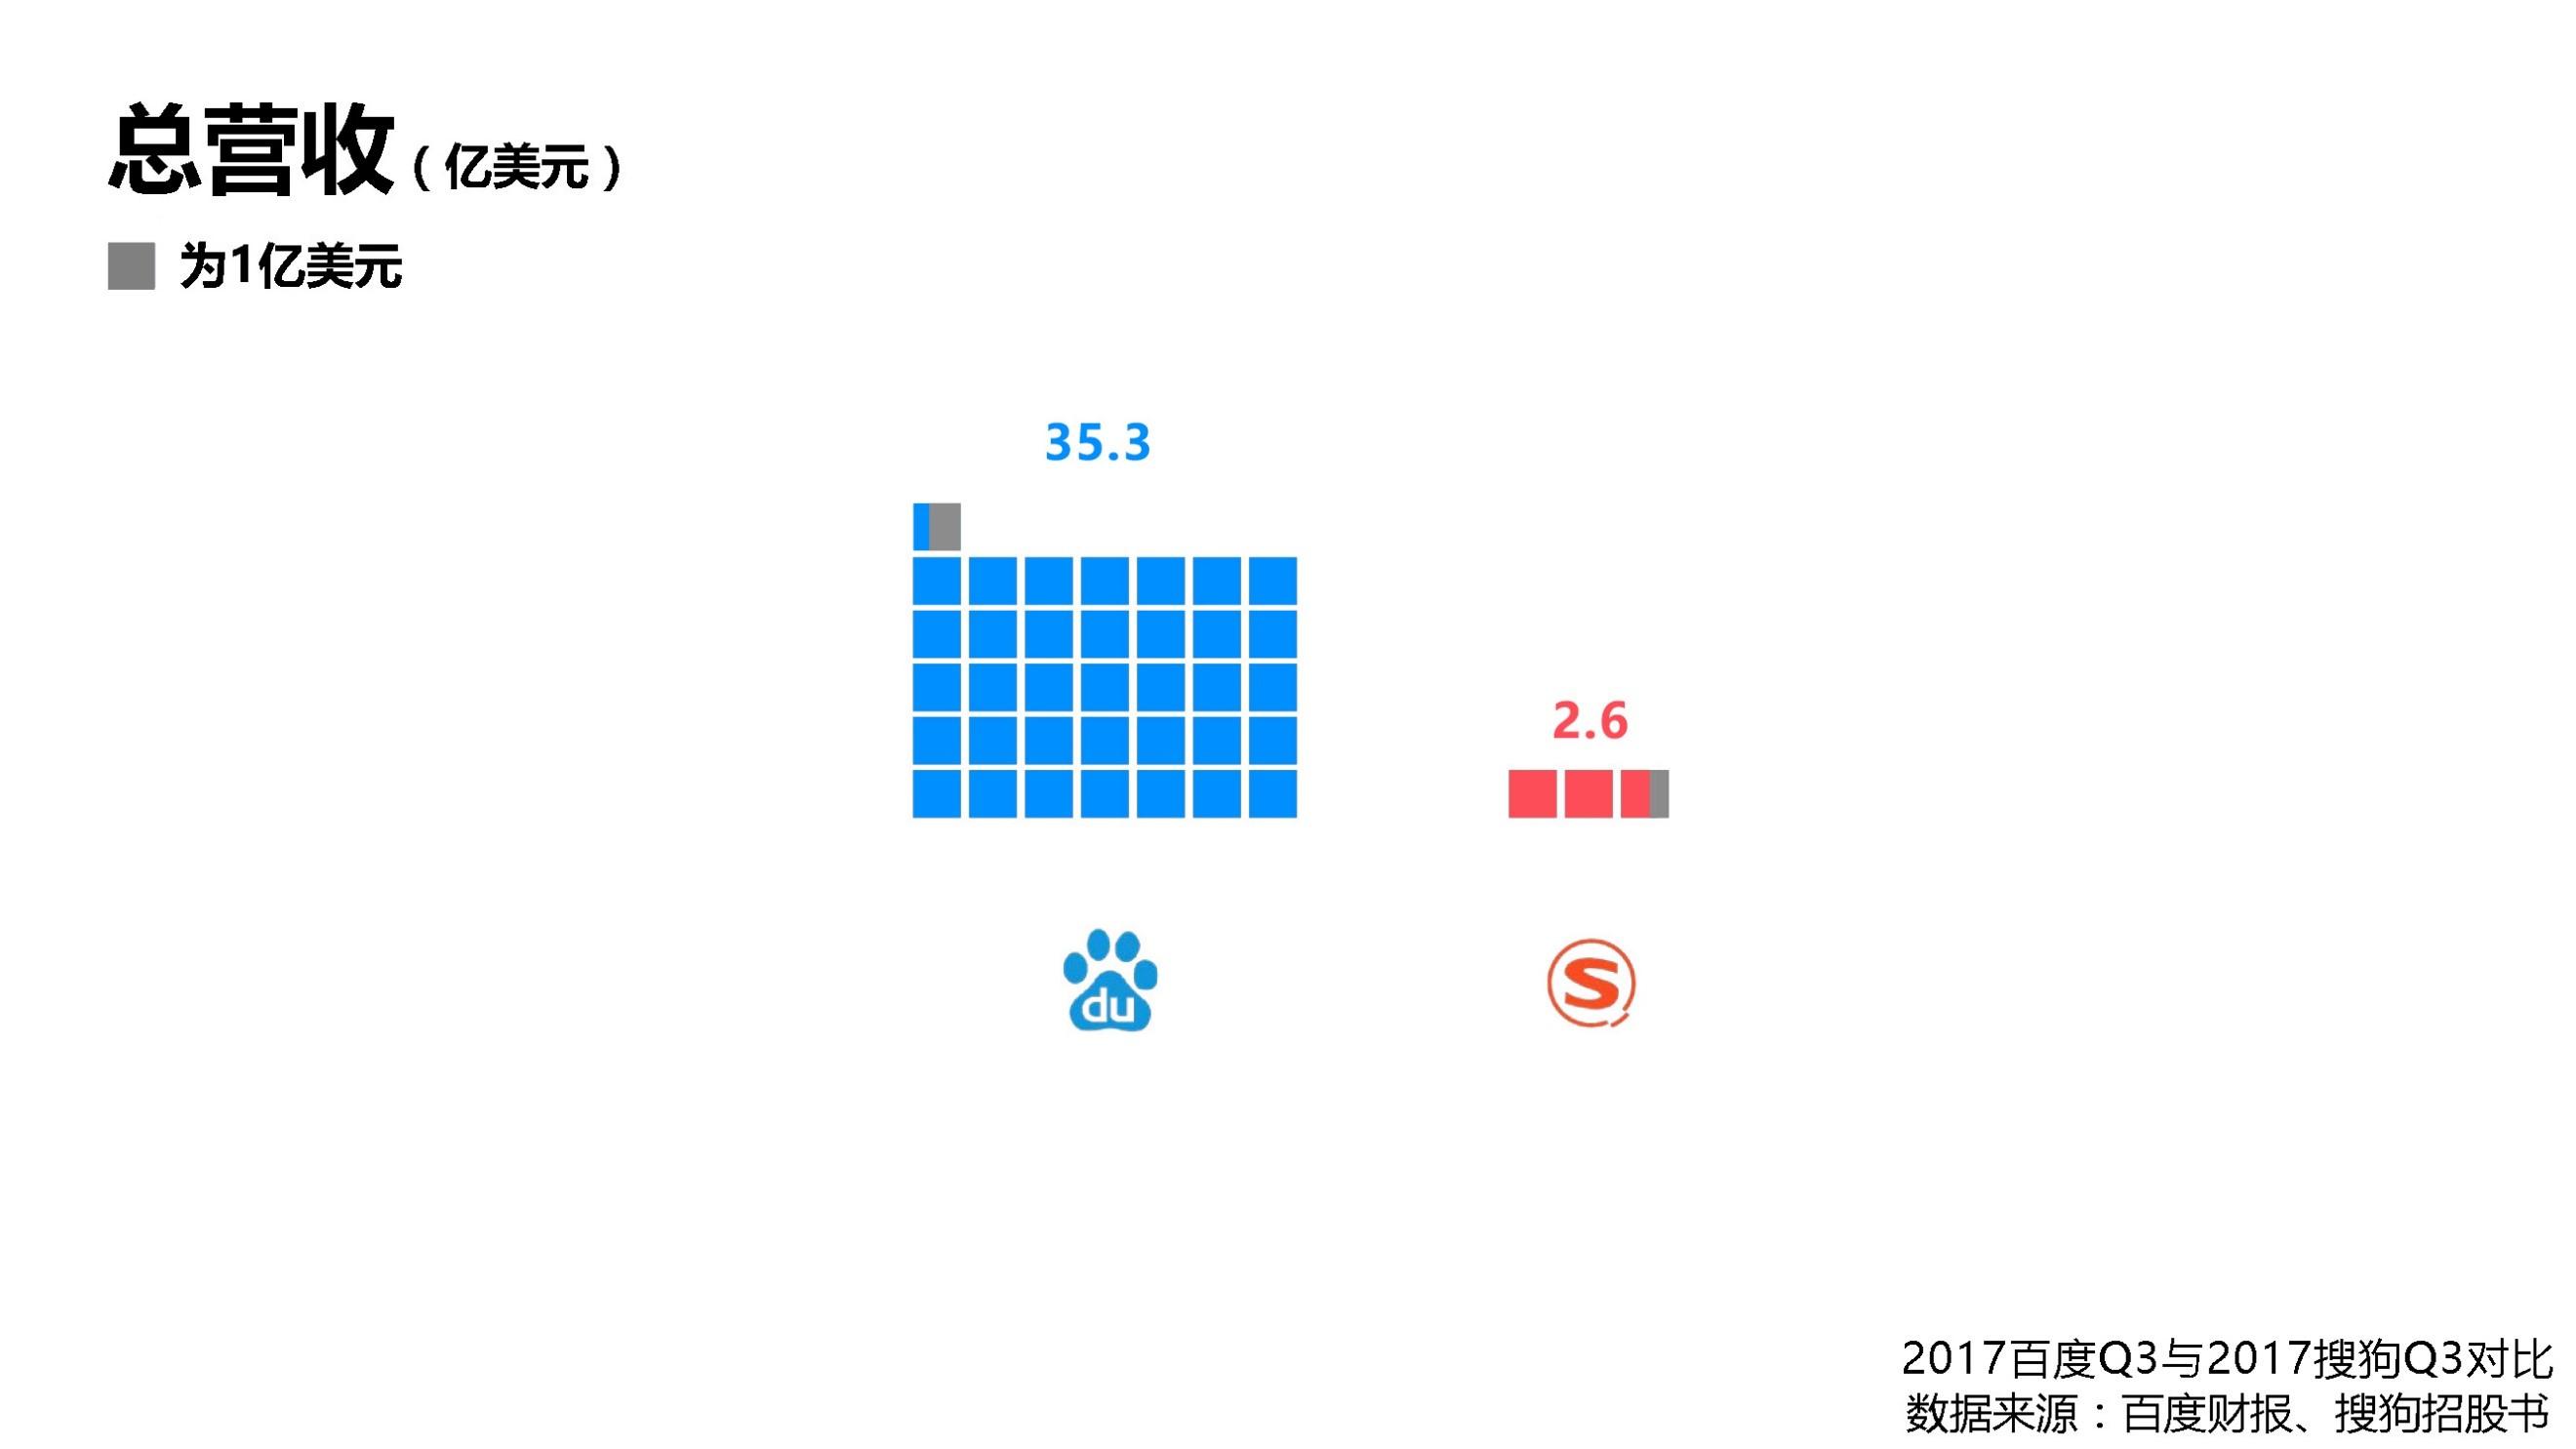 AI为搜狗IPO加分 能否PK百度上演后来者居上?